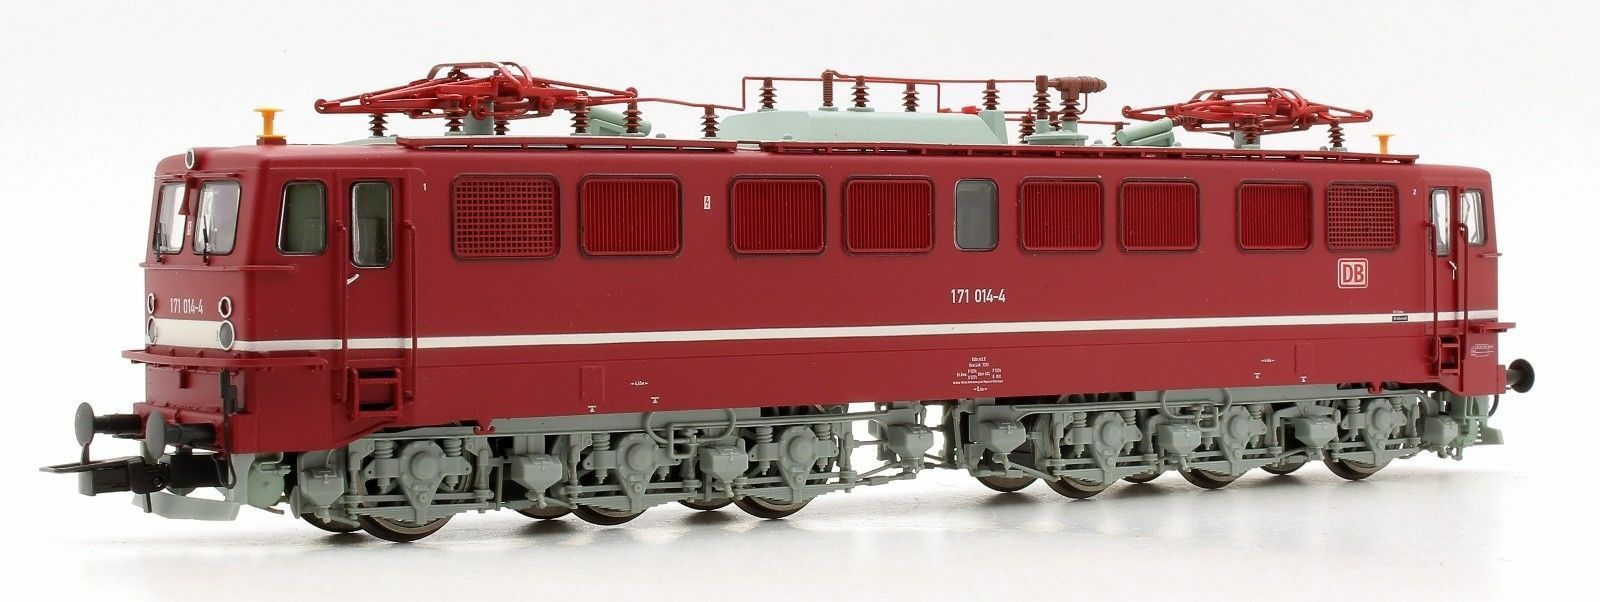 Rivarossi HR2608 Elektrrolokomotive DB Ag Ep.V 171 014 -4 neu